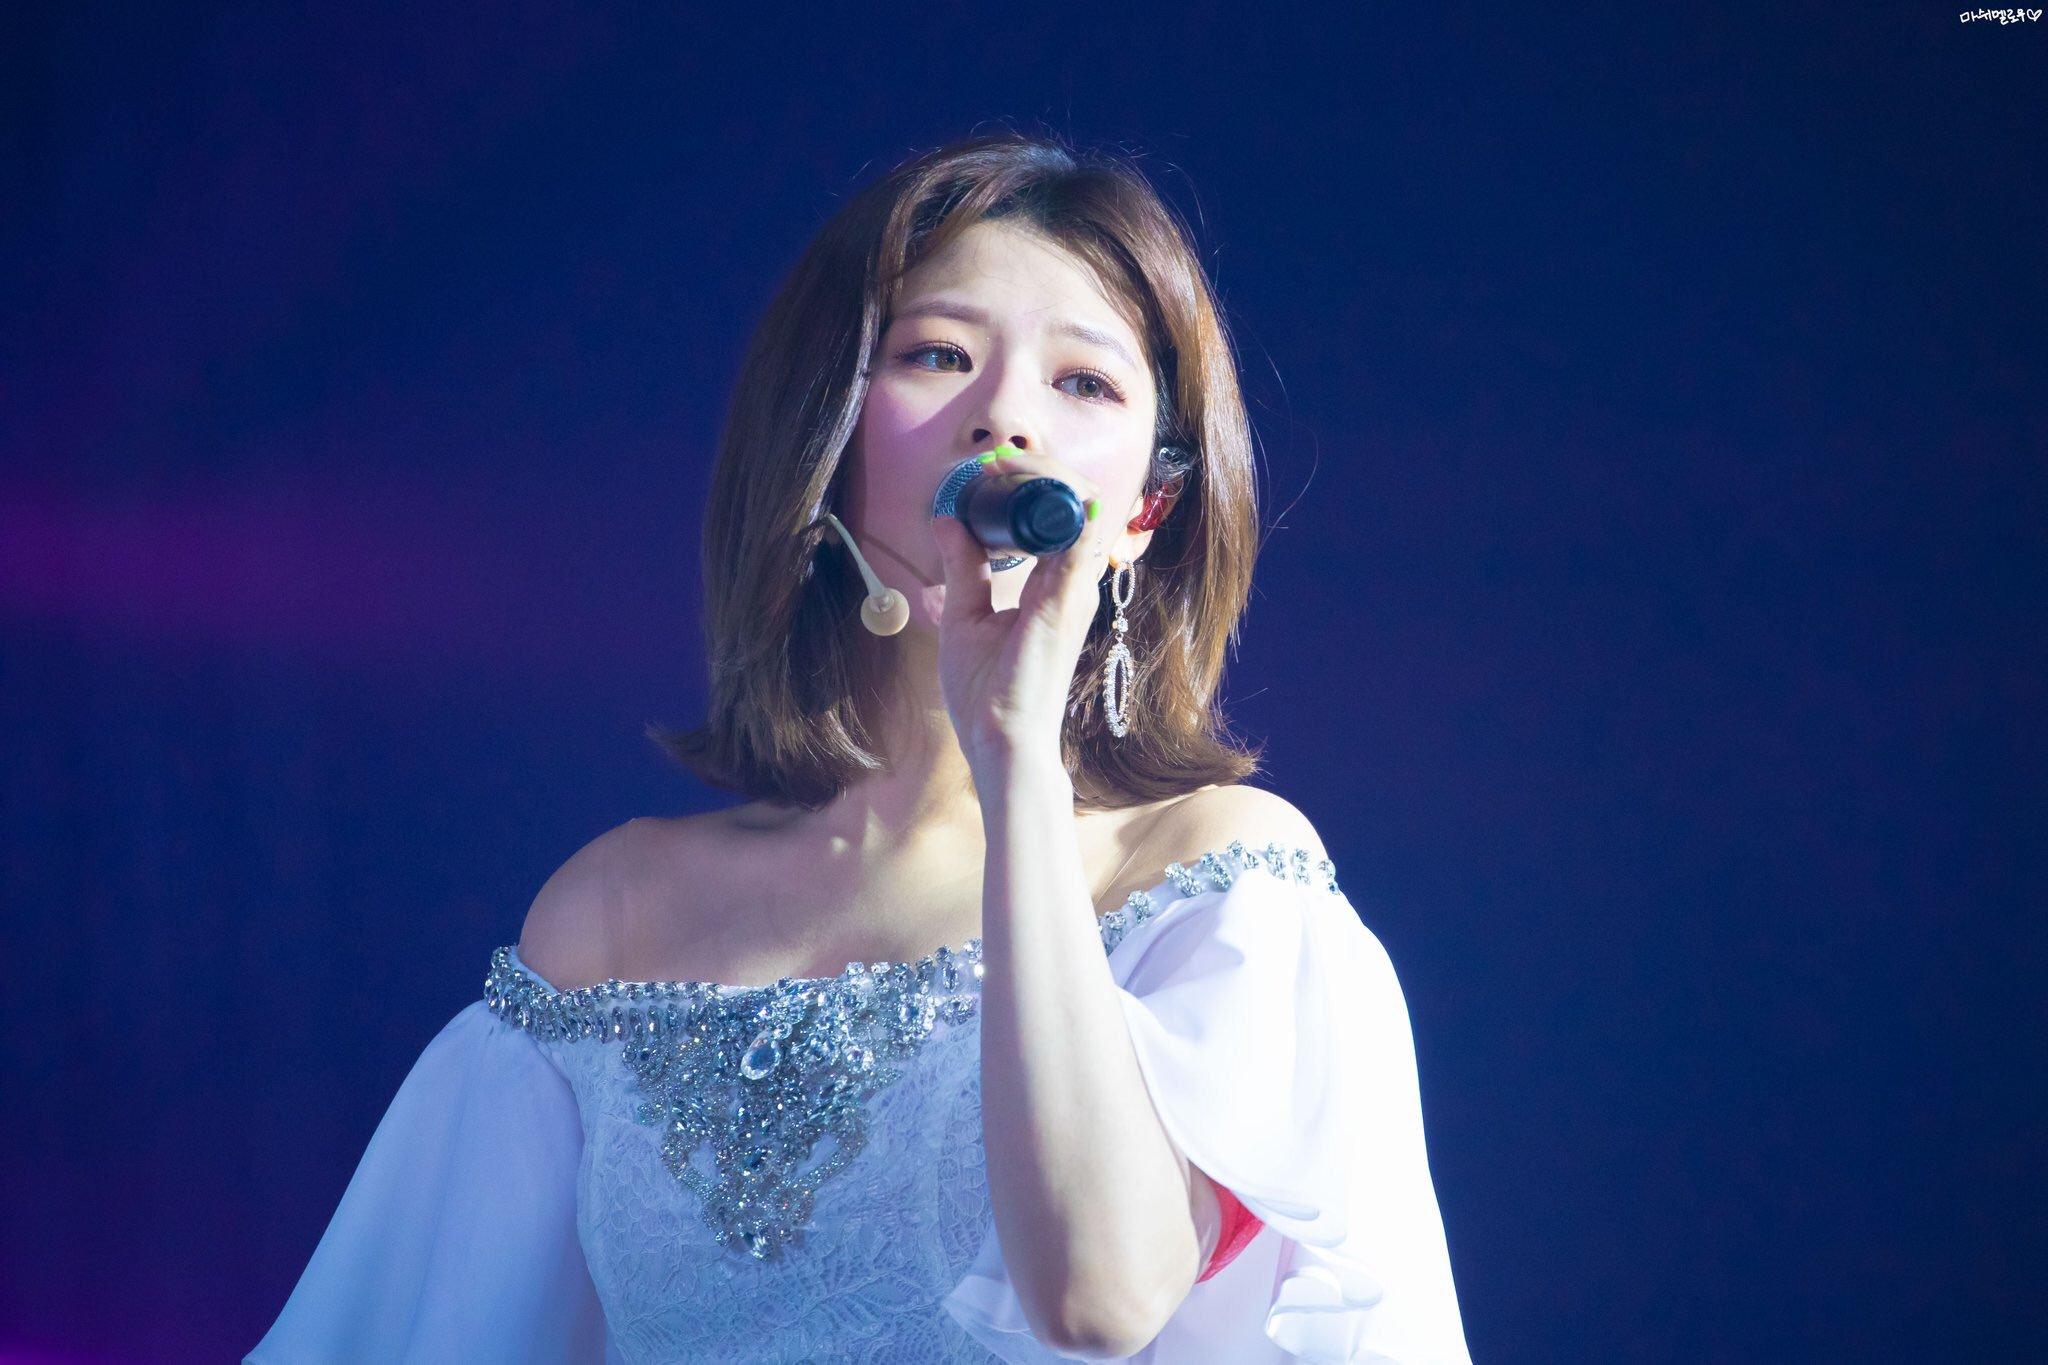 twice, twice profile, twice facts, twice height, twice age, twice leader, twice profile, twice jeongyeon, jeongyeon